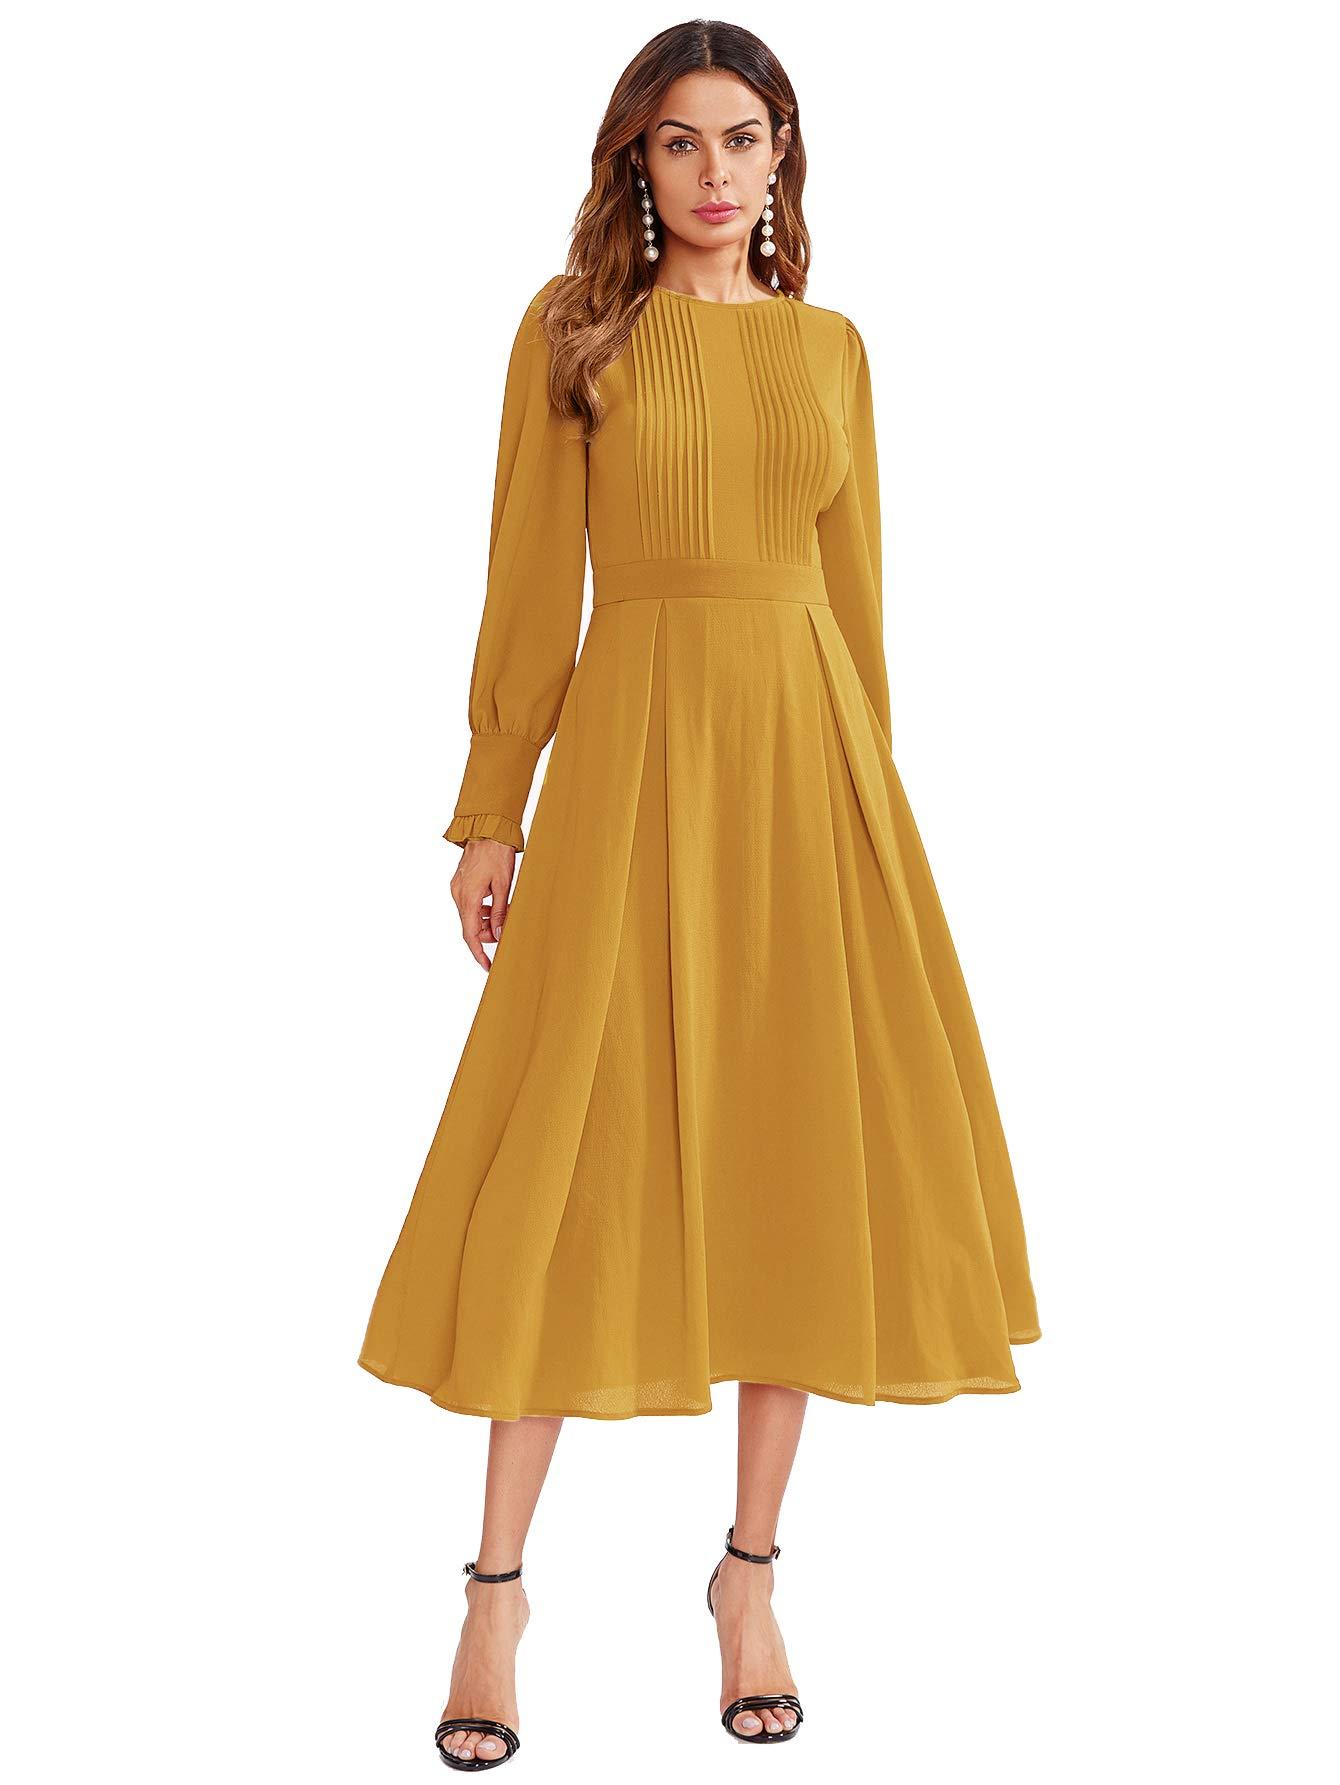 ab3dac9eae8d Milumia Women's Elegant Frilled Long Sleeve Pleated Fit & Flare ...